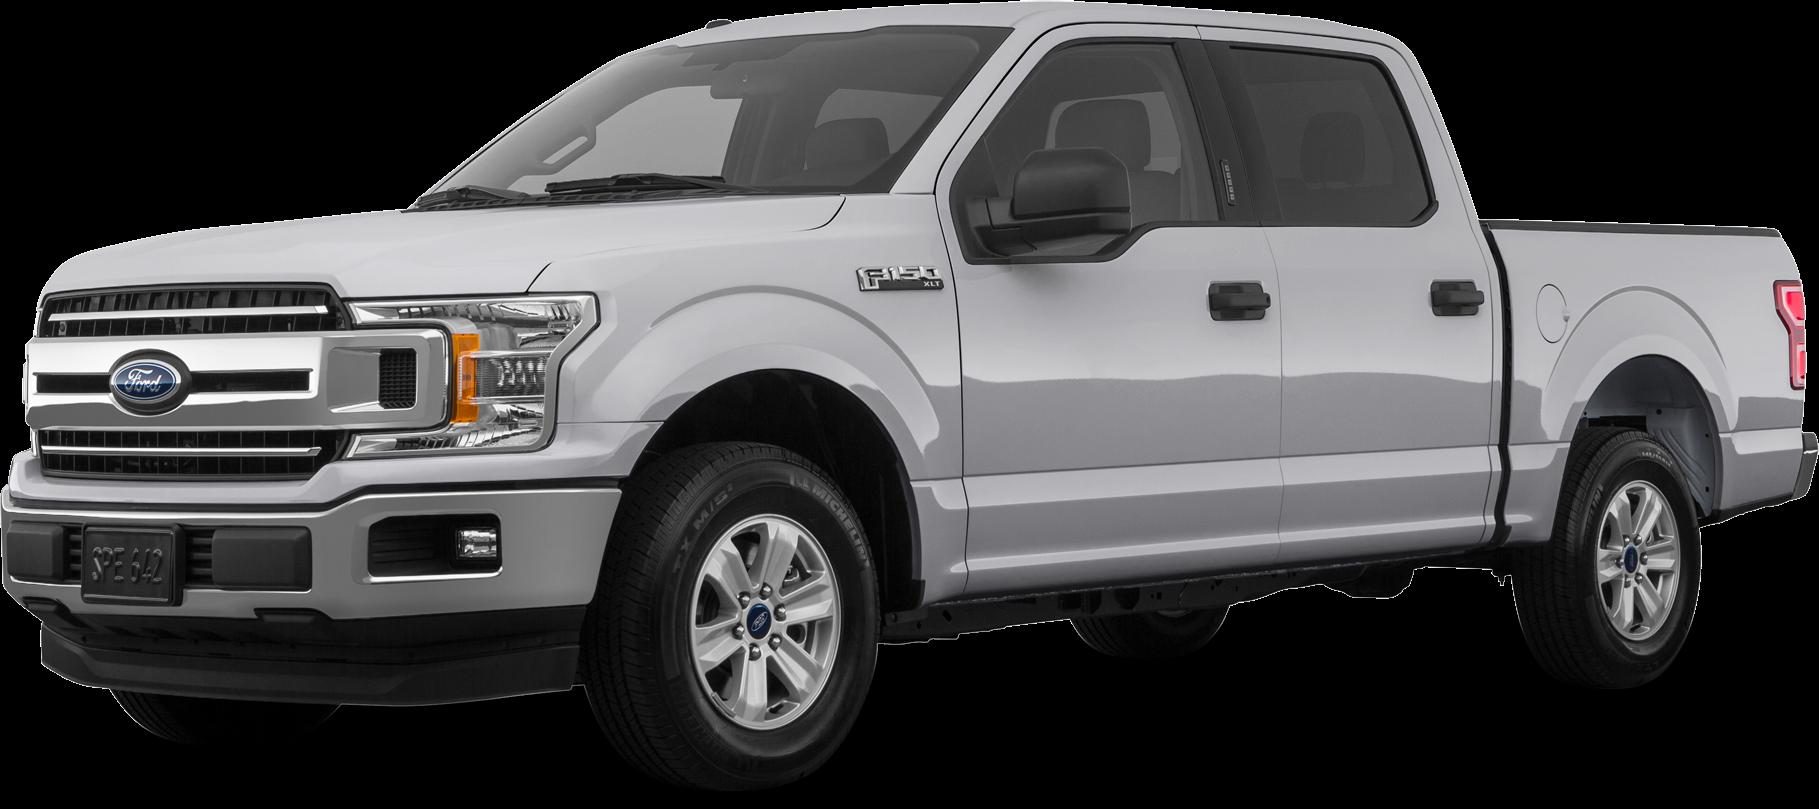 ford focus st 2017 price